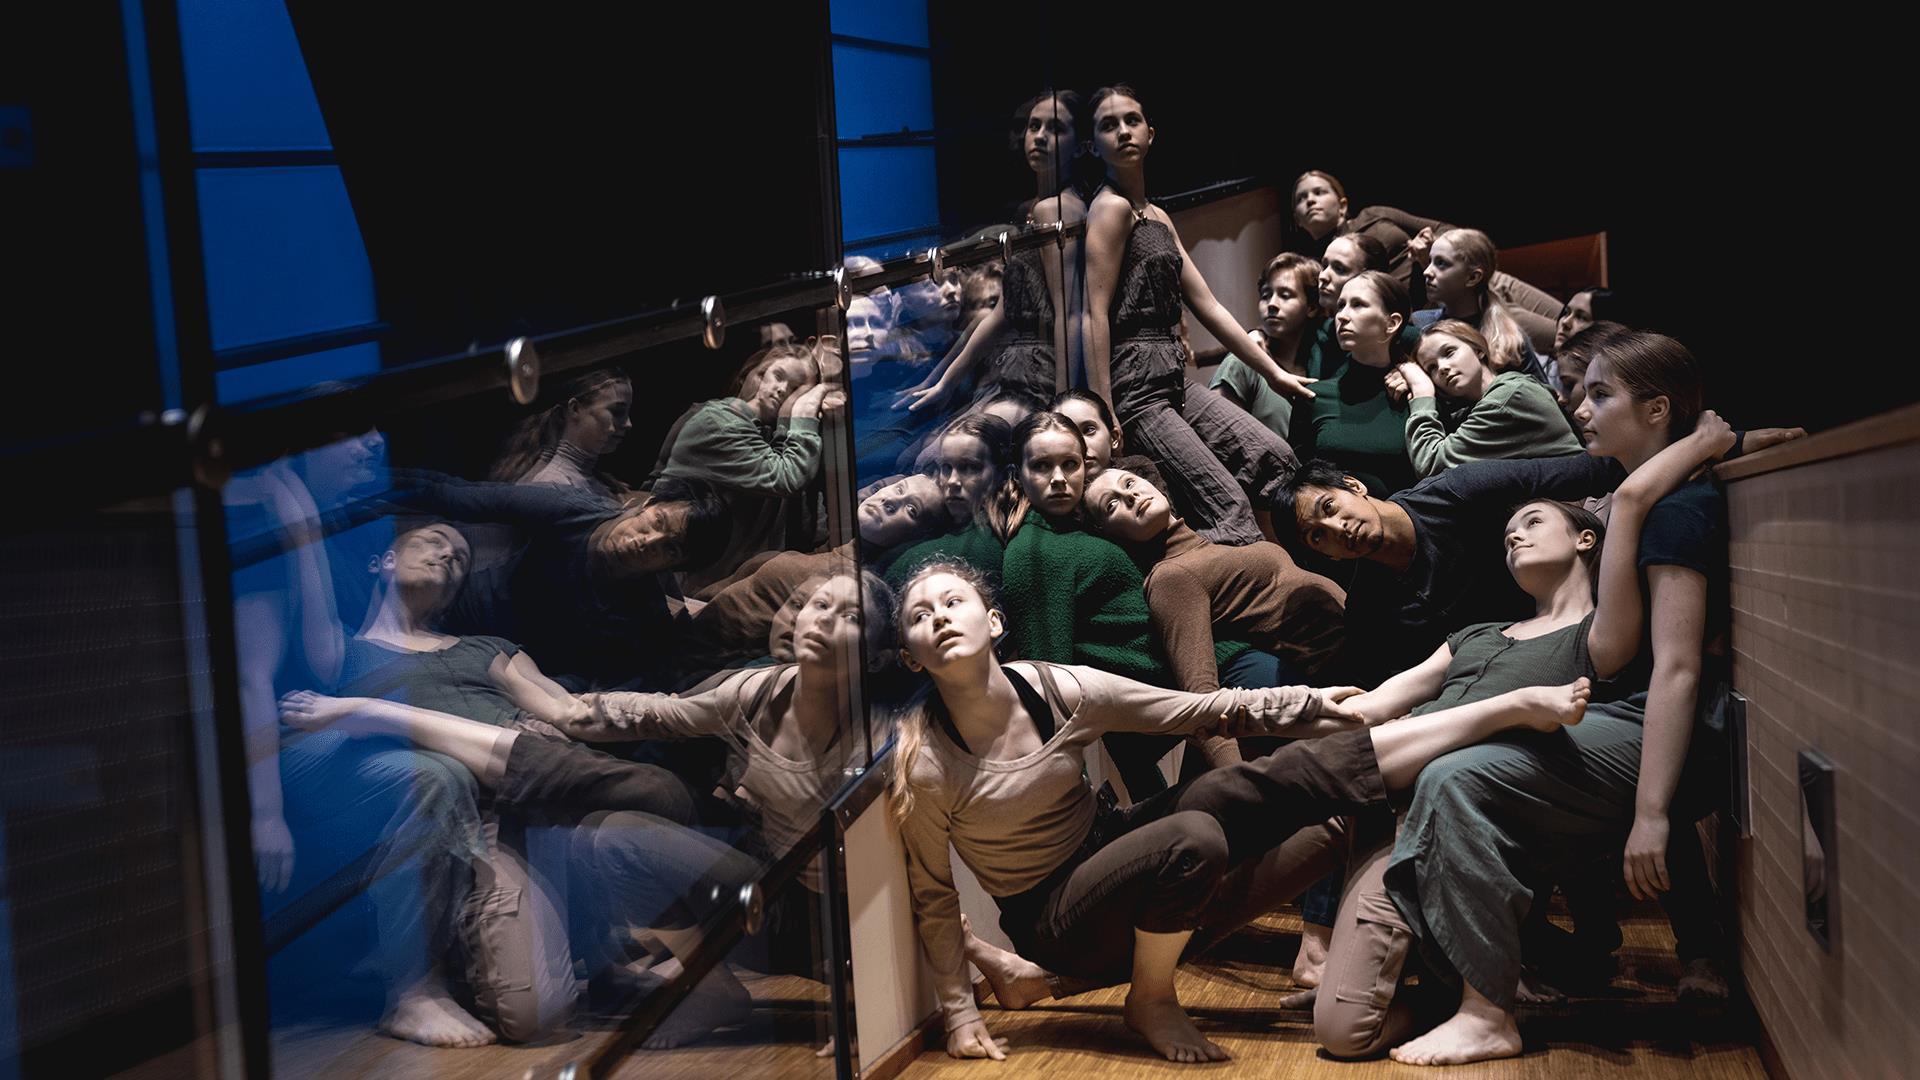 DanseFOT 2020